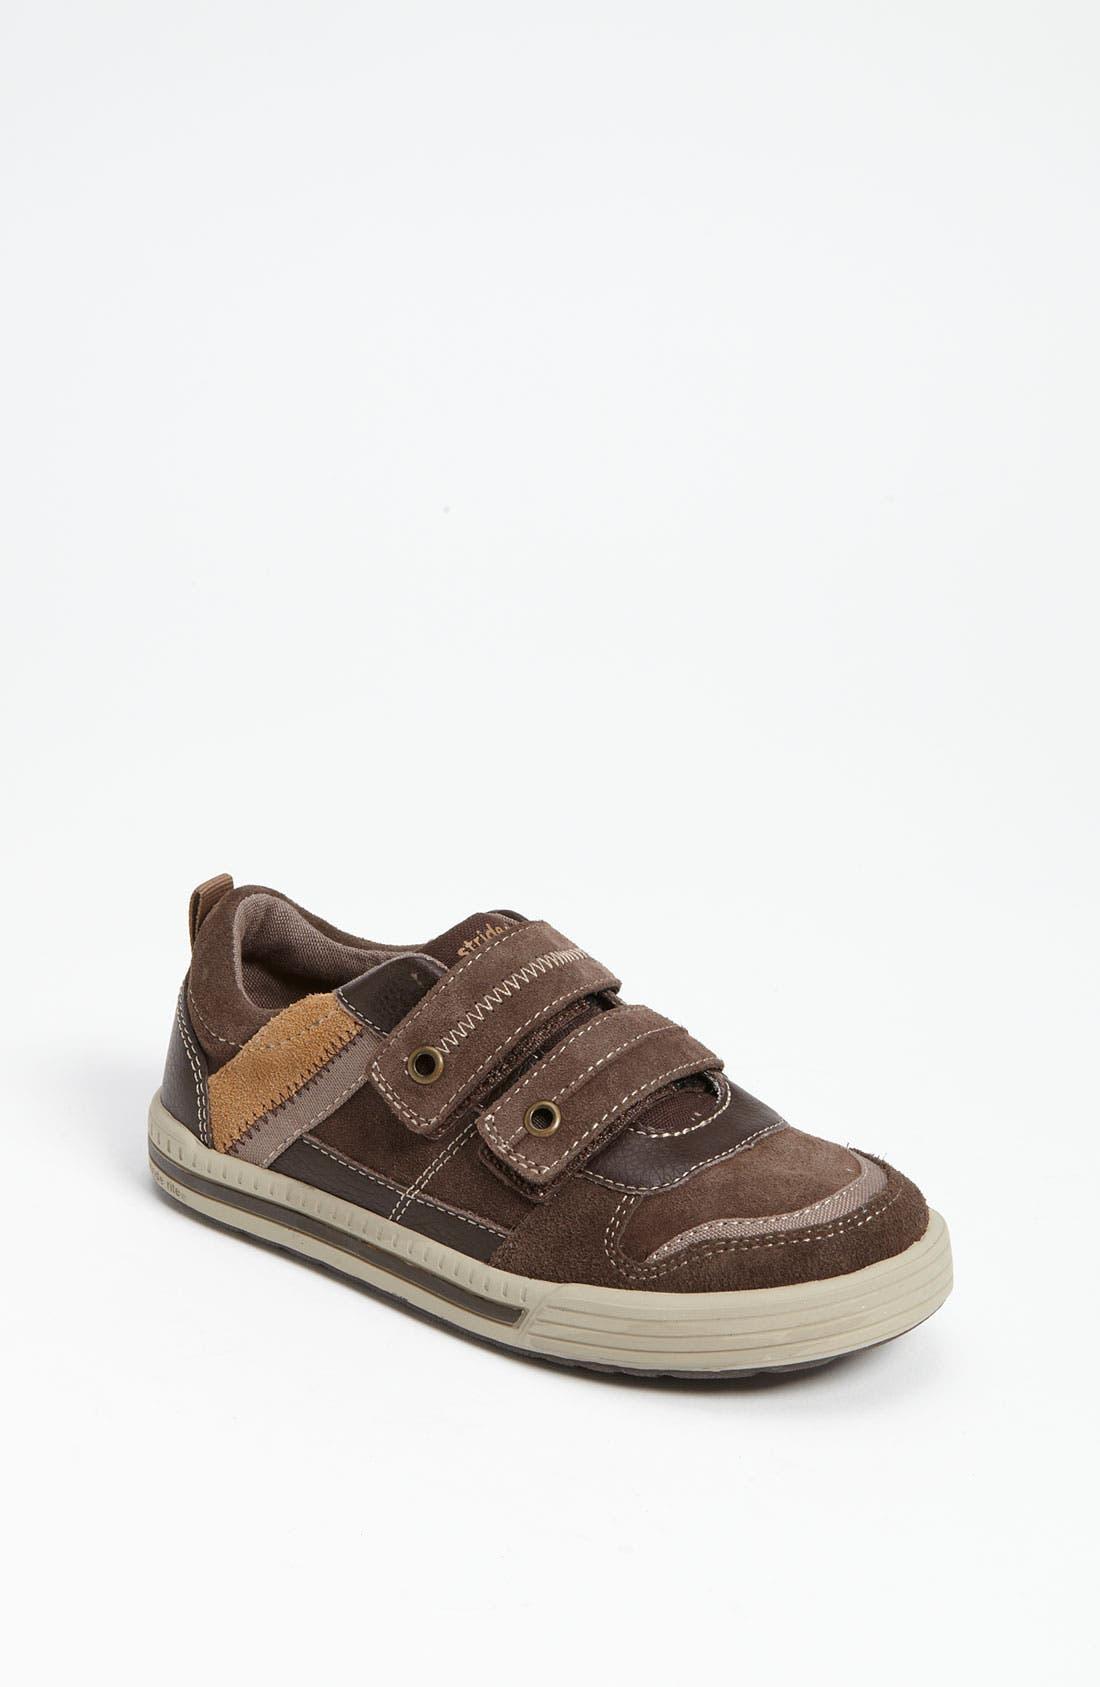 Alternate Image 1 Selected - Stride Rite 'Tex' Sneaker (Toddler)